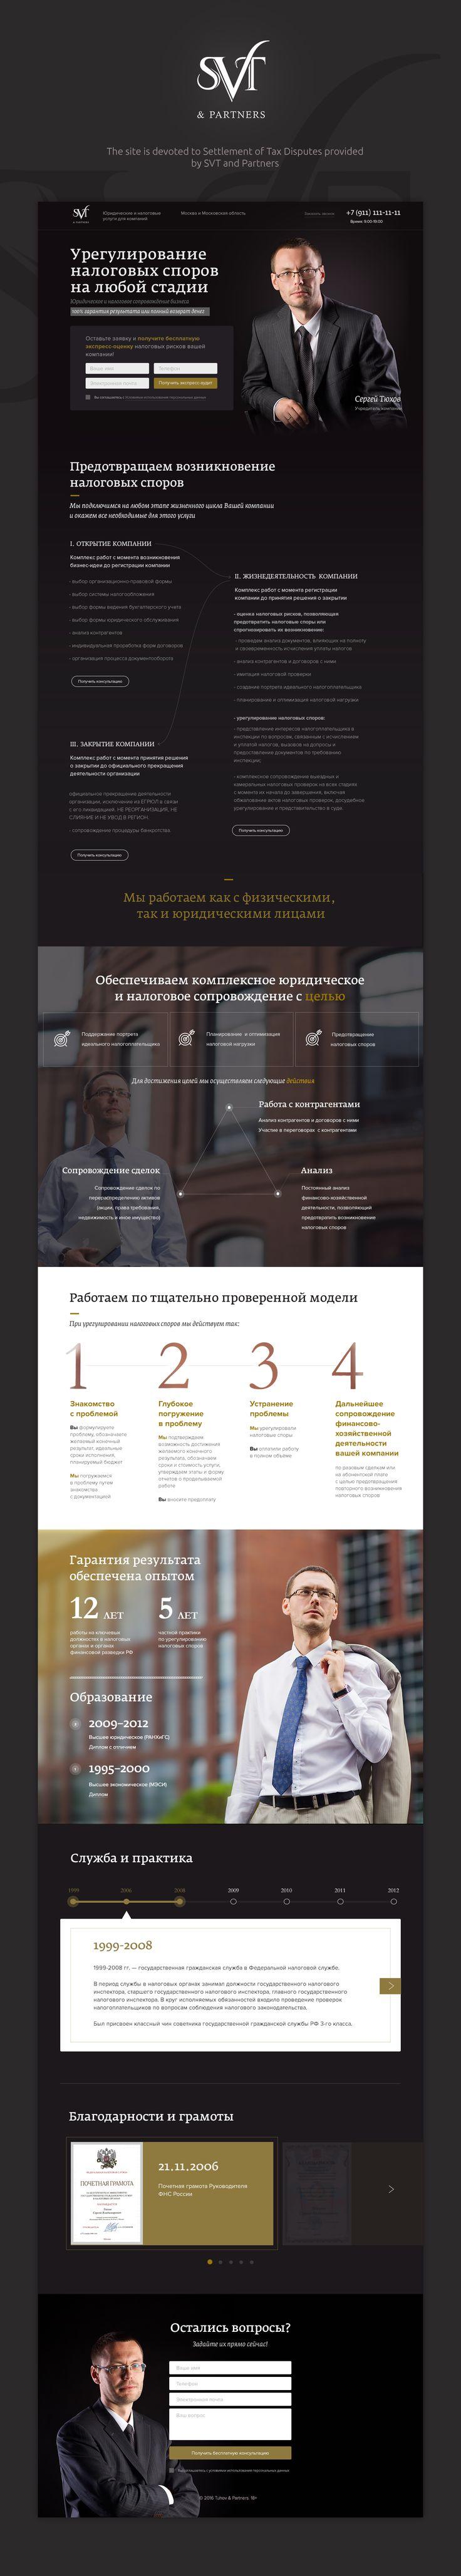 Yaroslav Kirsanov on Behance